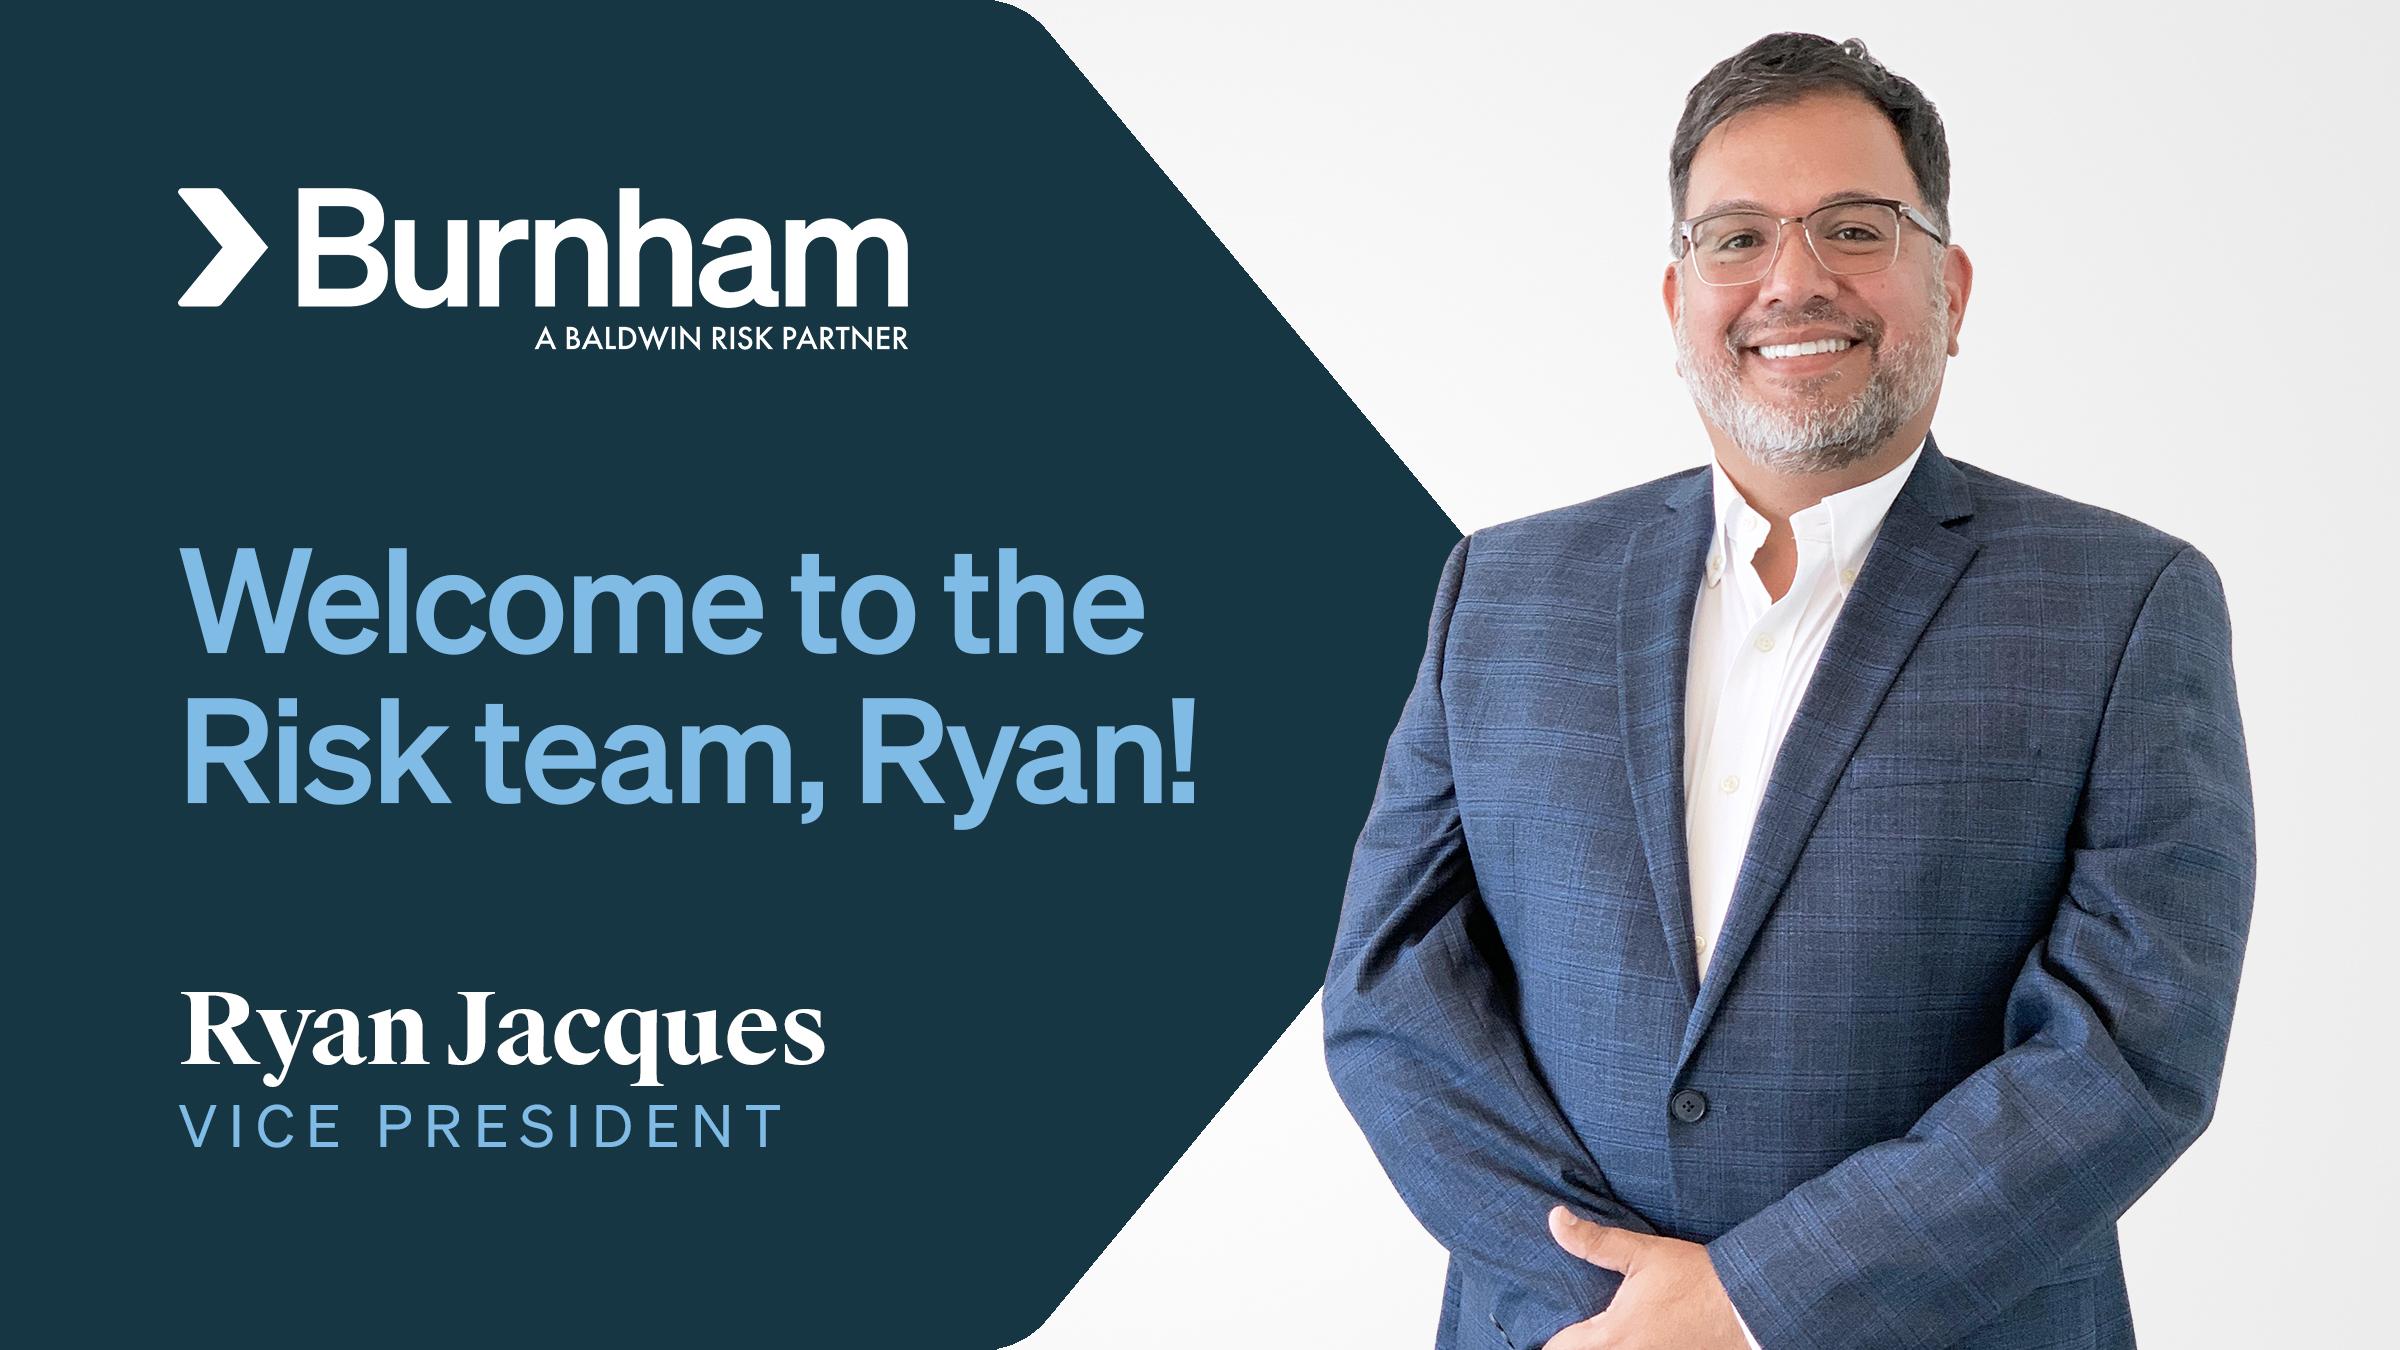 Ryan Jacques